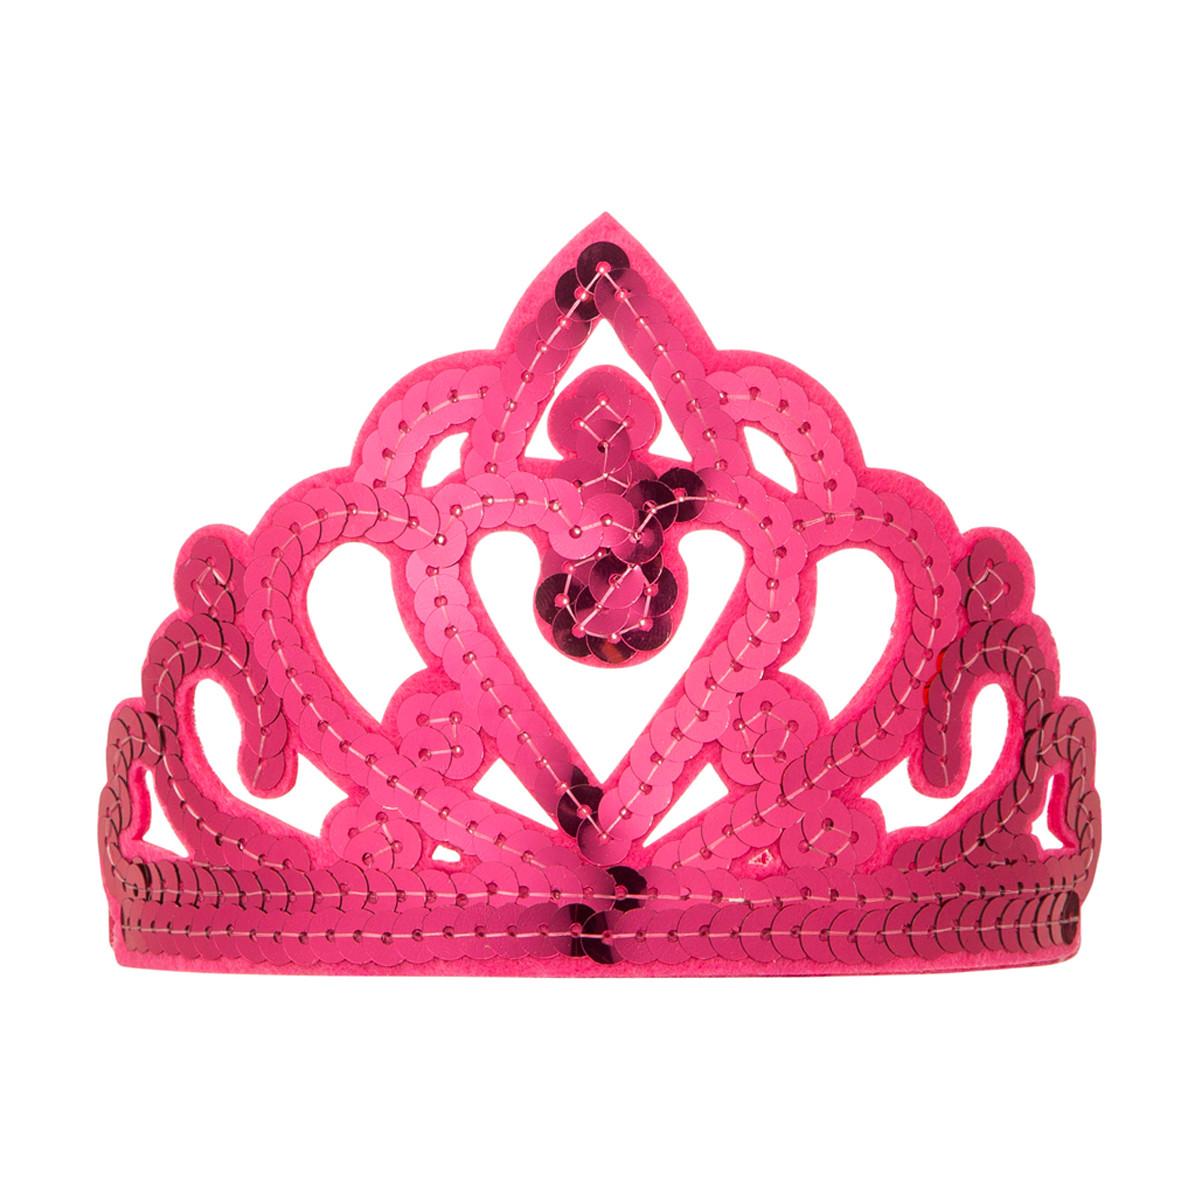 Hair accessories launceston - Sequin Tiara Headband Pink